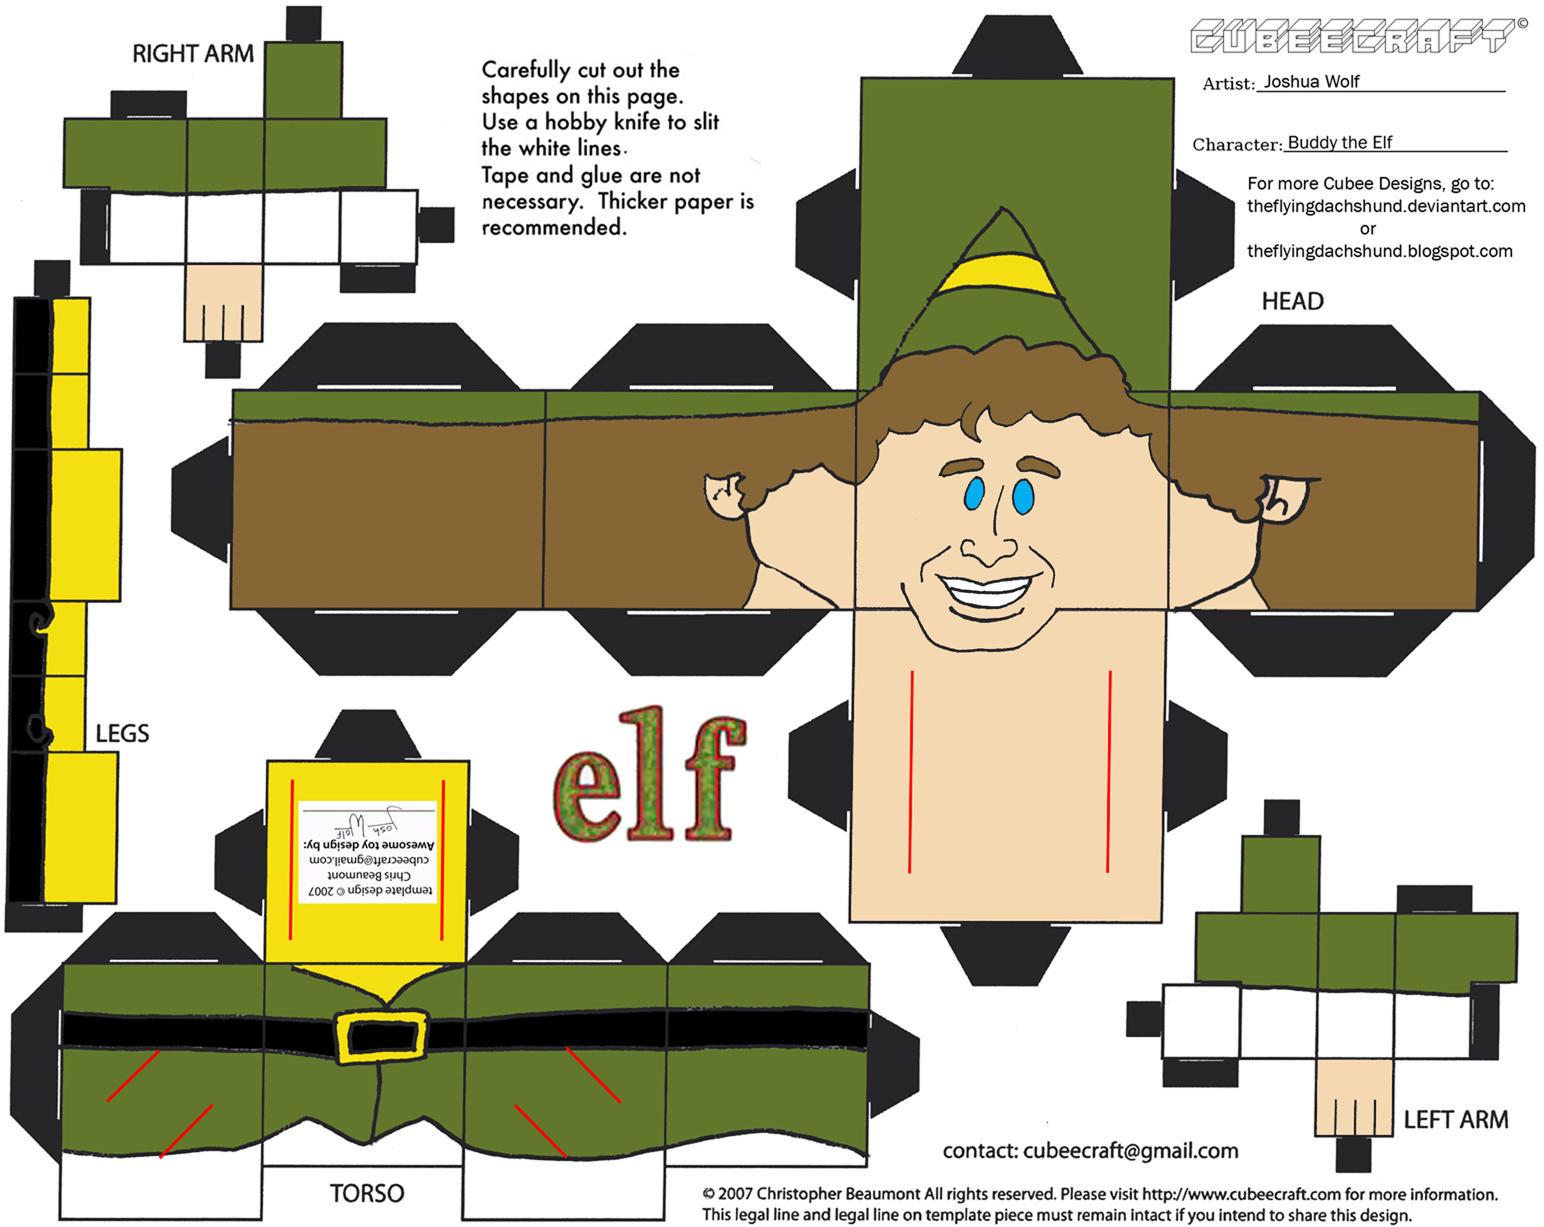 Buddy The Elf Cutout The Polar Express Train Life Size Cardboard